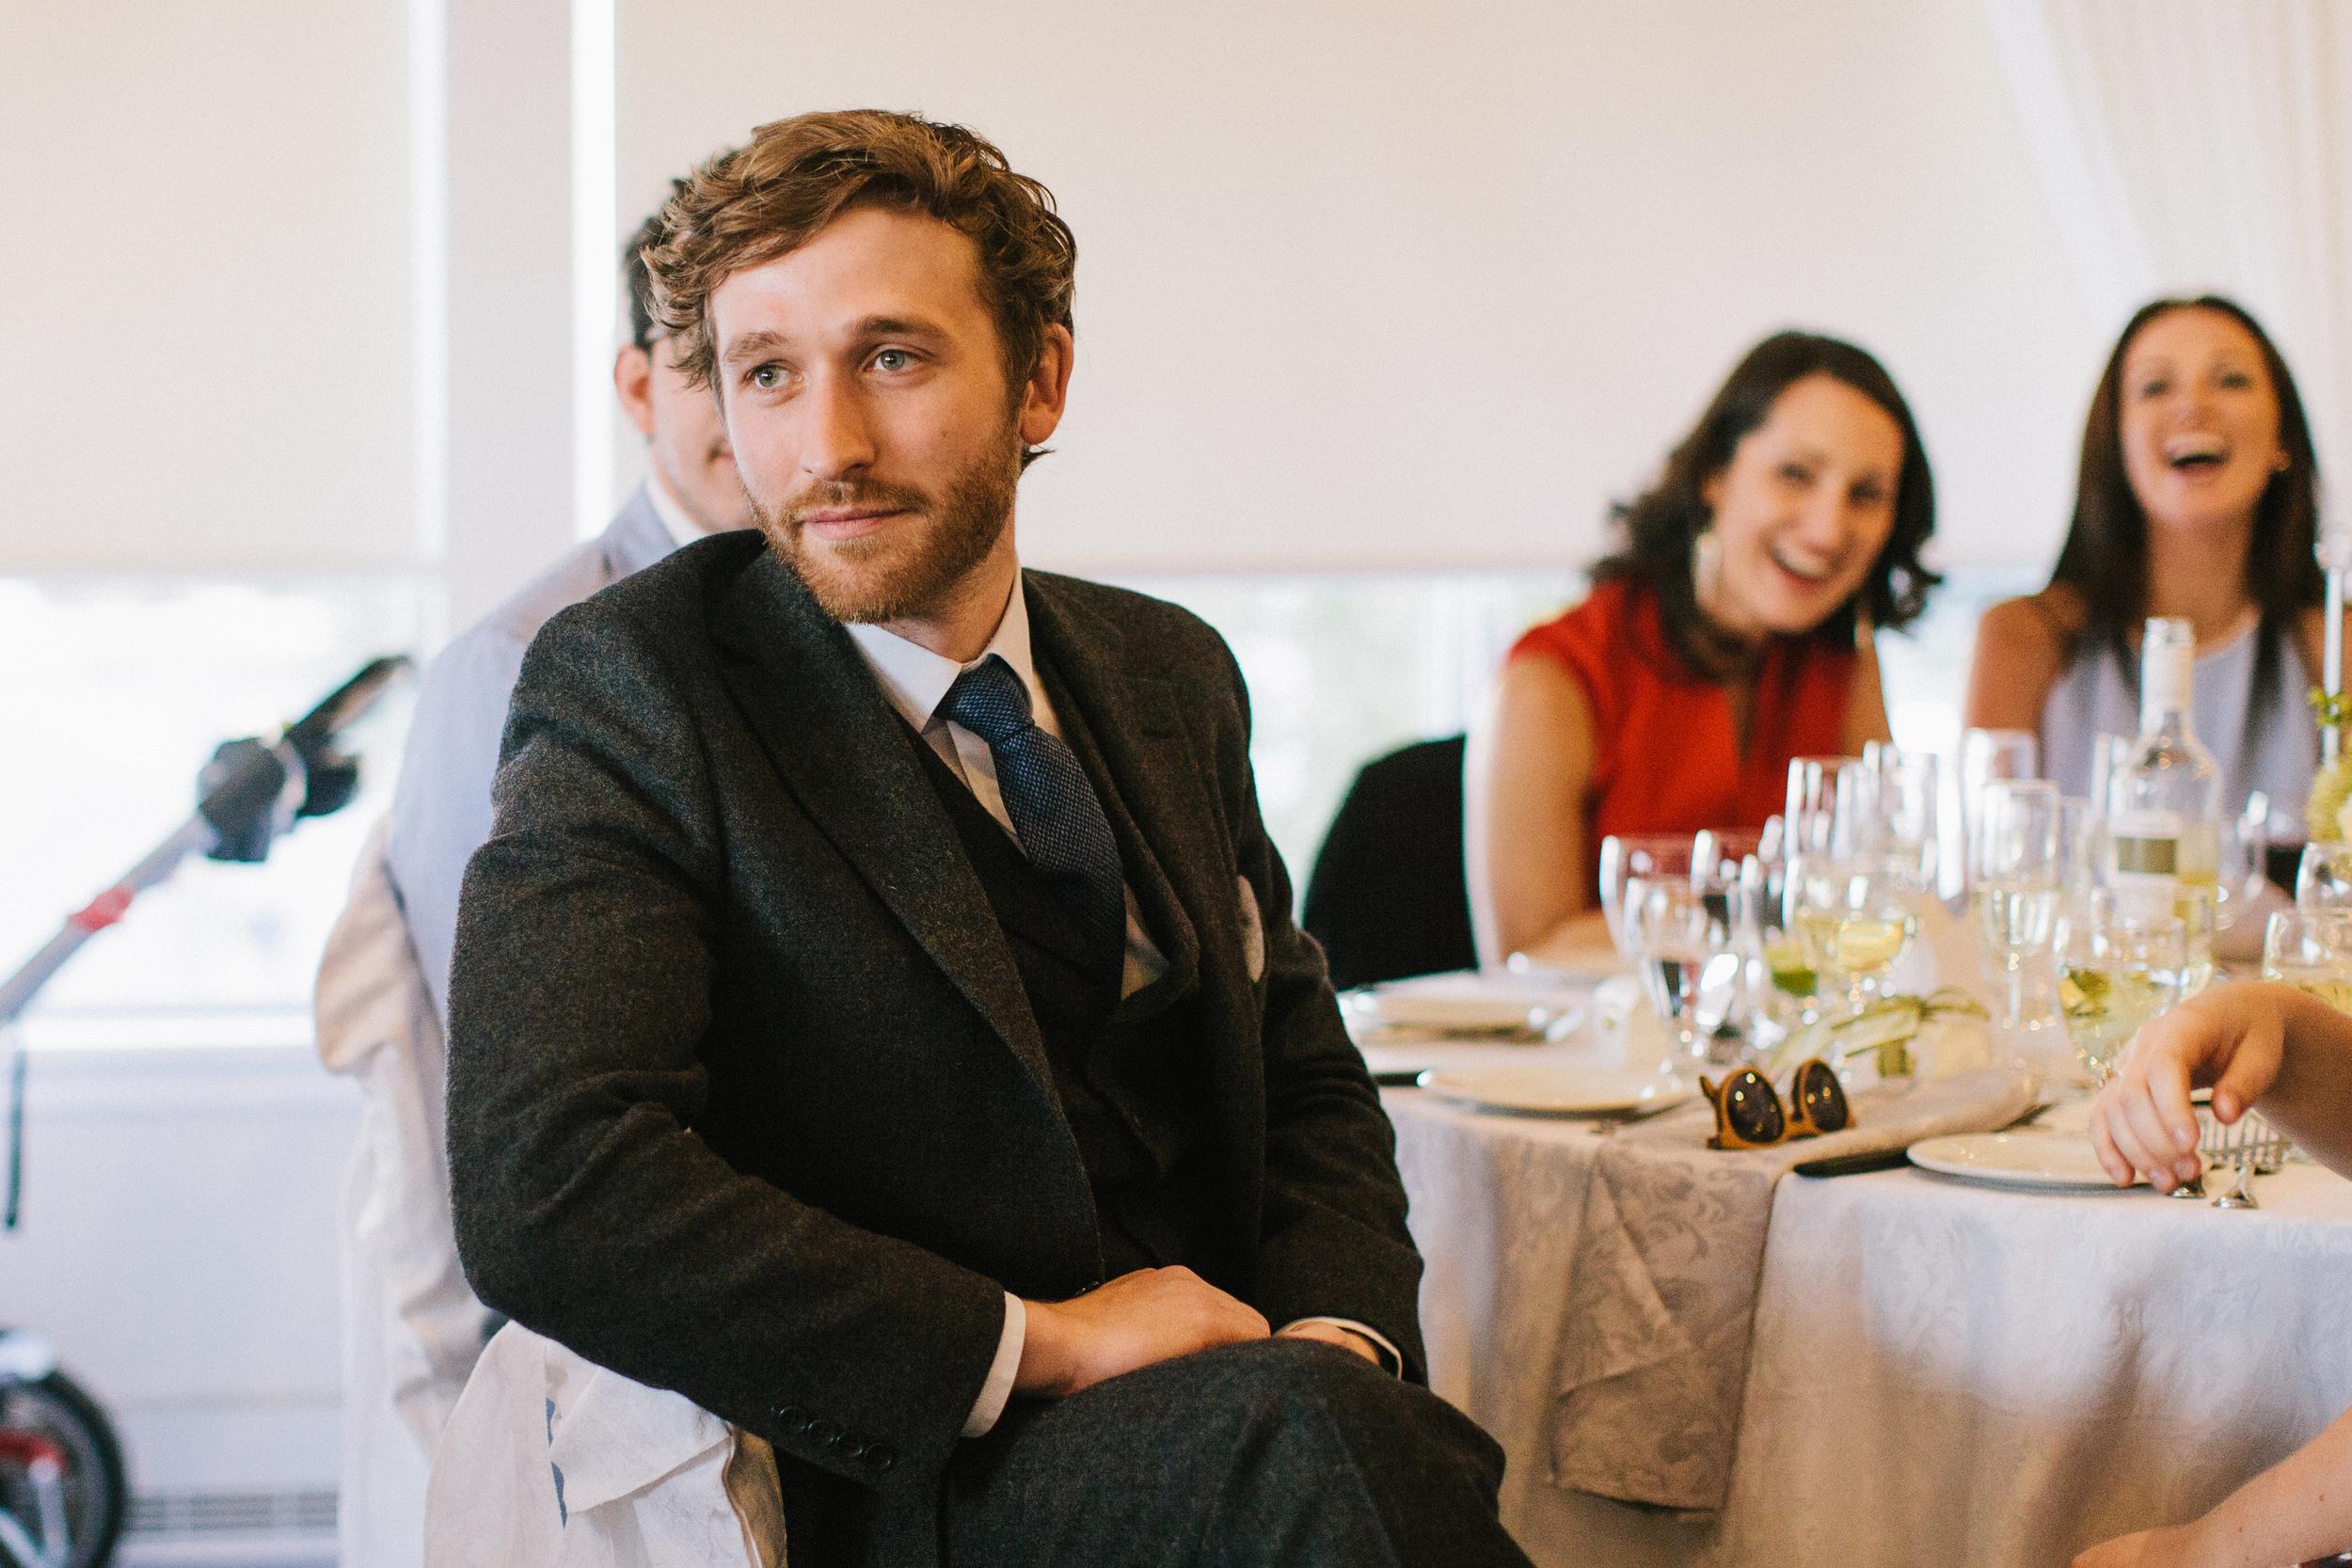 harbour-banquet-hall-oakville-wedding-photographer-michael-rousseau-photography-persian-wedding-photographer-isabella-daniel052.JPG